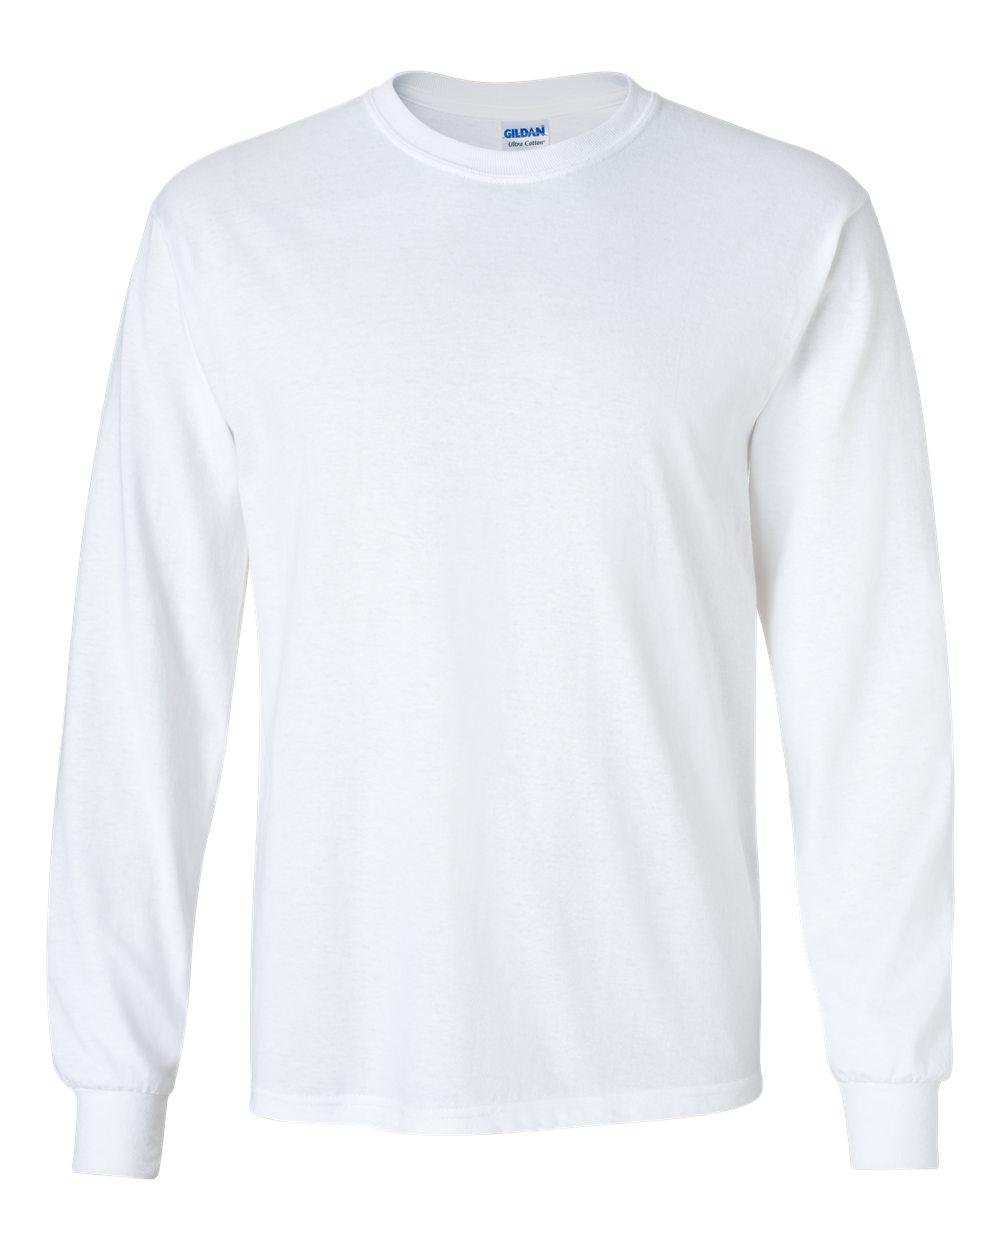 Long Sleeve Tee Shirts Bulk Rockwall Auction